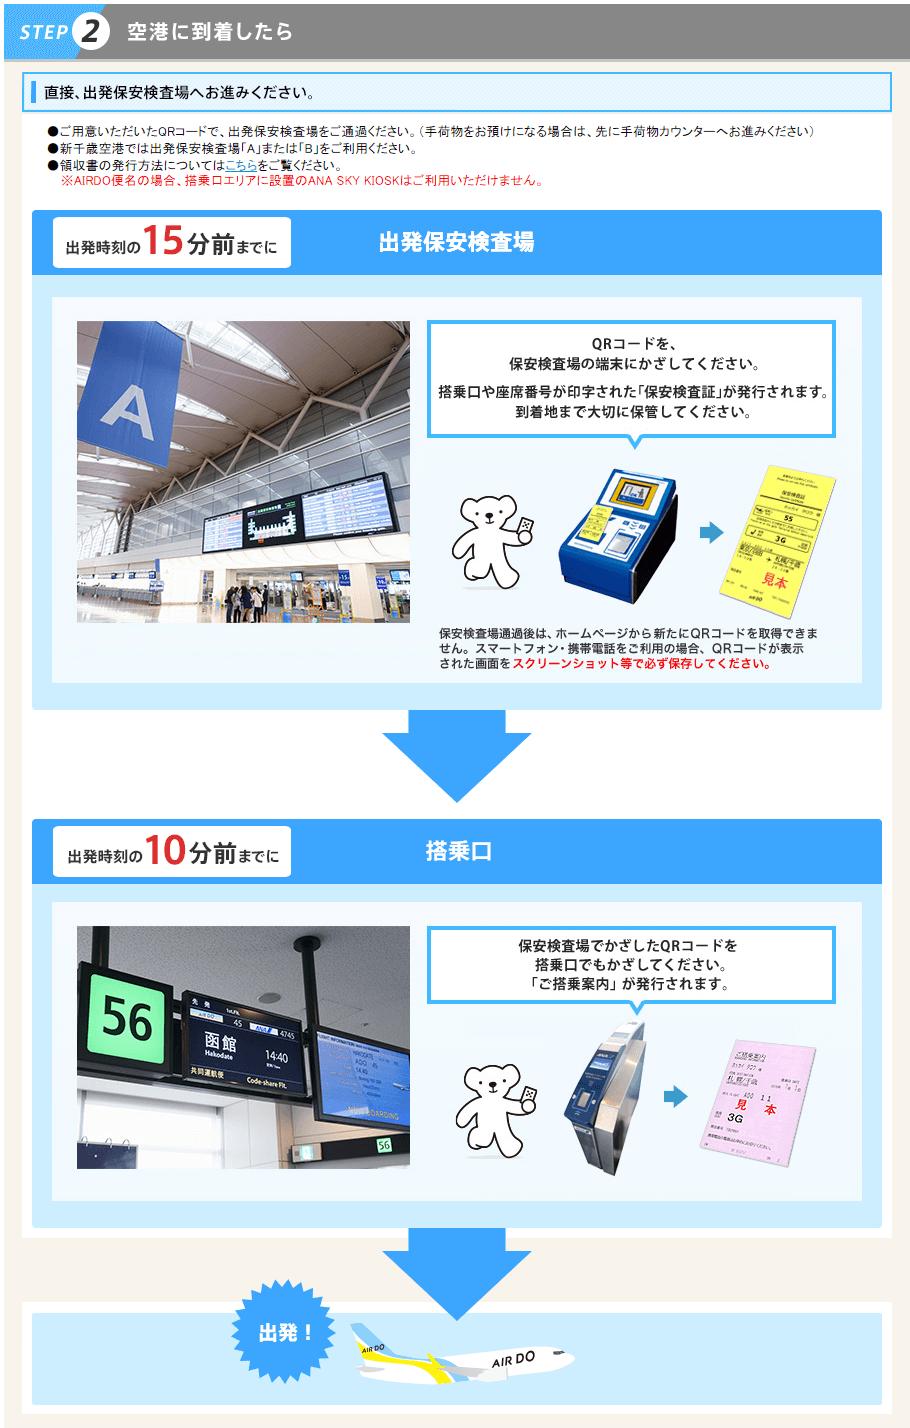 AIR DO(エアドゥ)の空港でのチェックイン方法